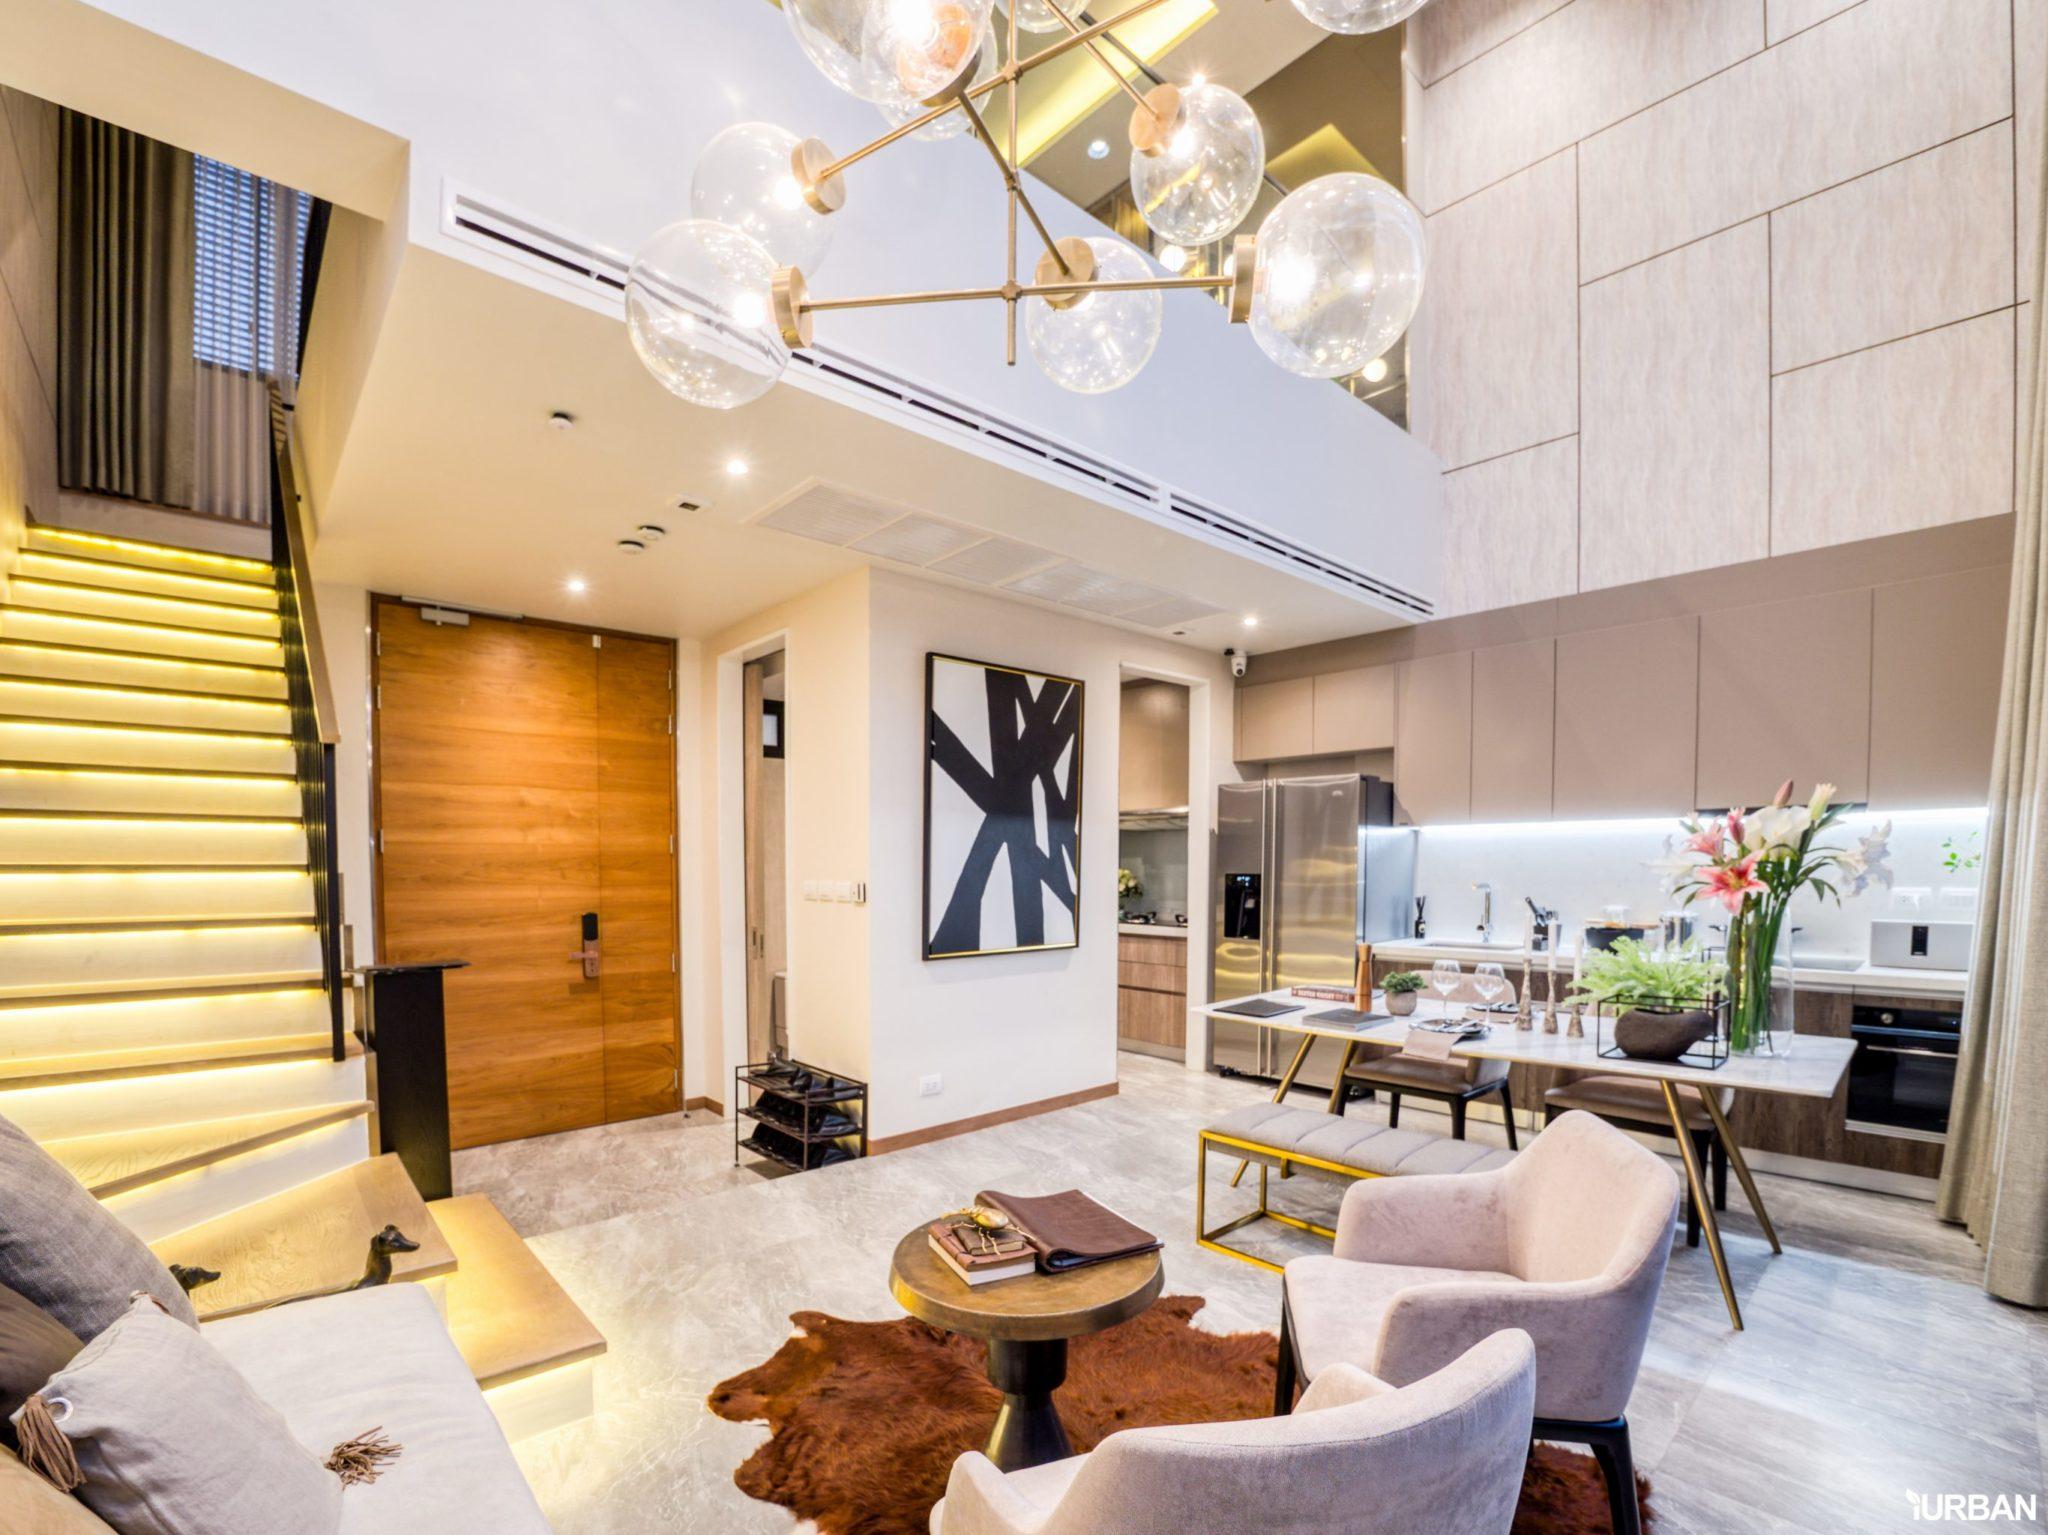 AIRES RAMA9 รีวิว Luxury Townhome 3.5 ชั้น + Rooftop ออกแบบสวย ย่านพระราม9 (ใกล้ รพ.สมิติเวช) 29 - AIRES